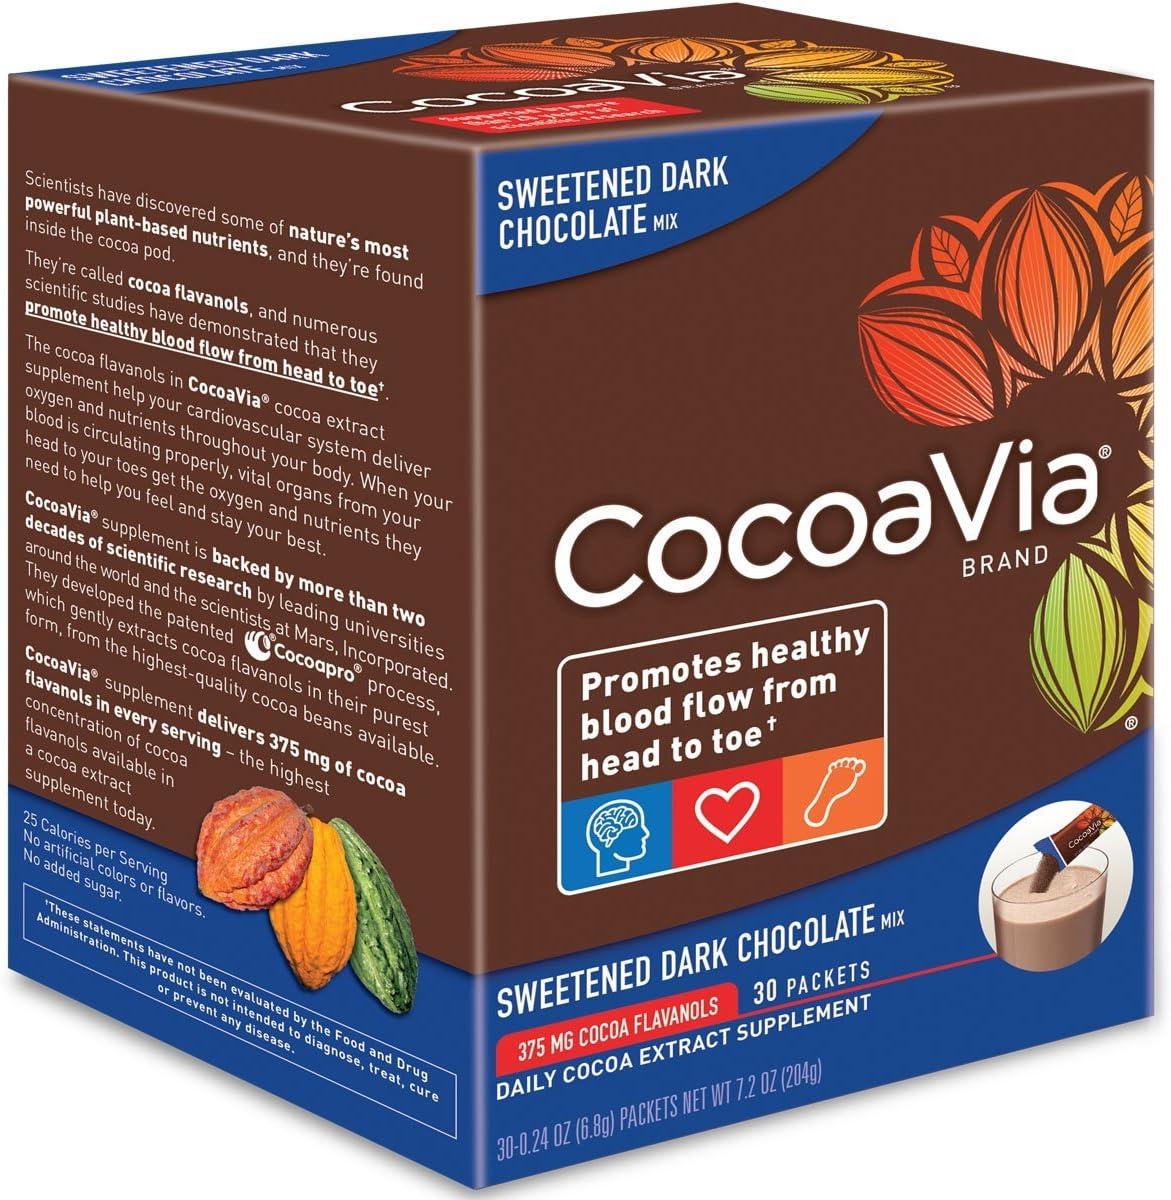 CocoaVia Brain Heart Supplement, Sweetened Dark Chocolate Flavor, Powdered Mix, 375mg Cocoa Flavanols, 30-Day Supply